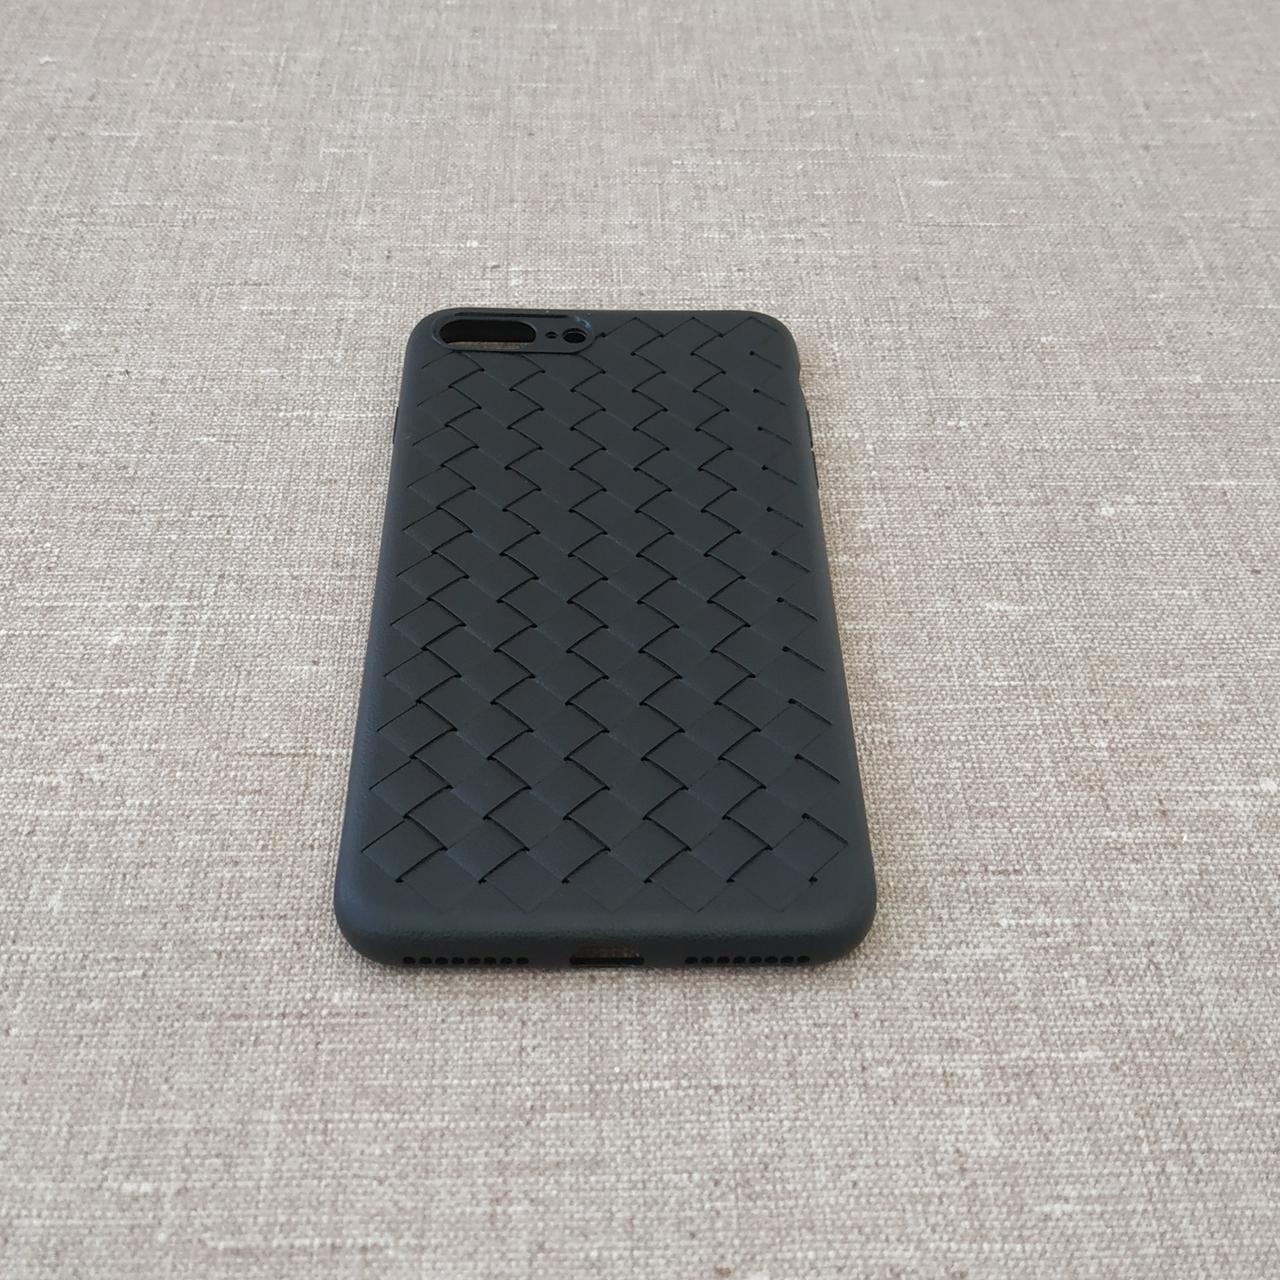 Накладка Proda Tiragor iPhone 7 Plus black Для телефона